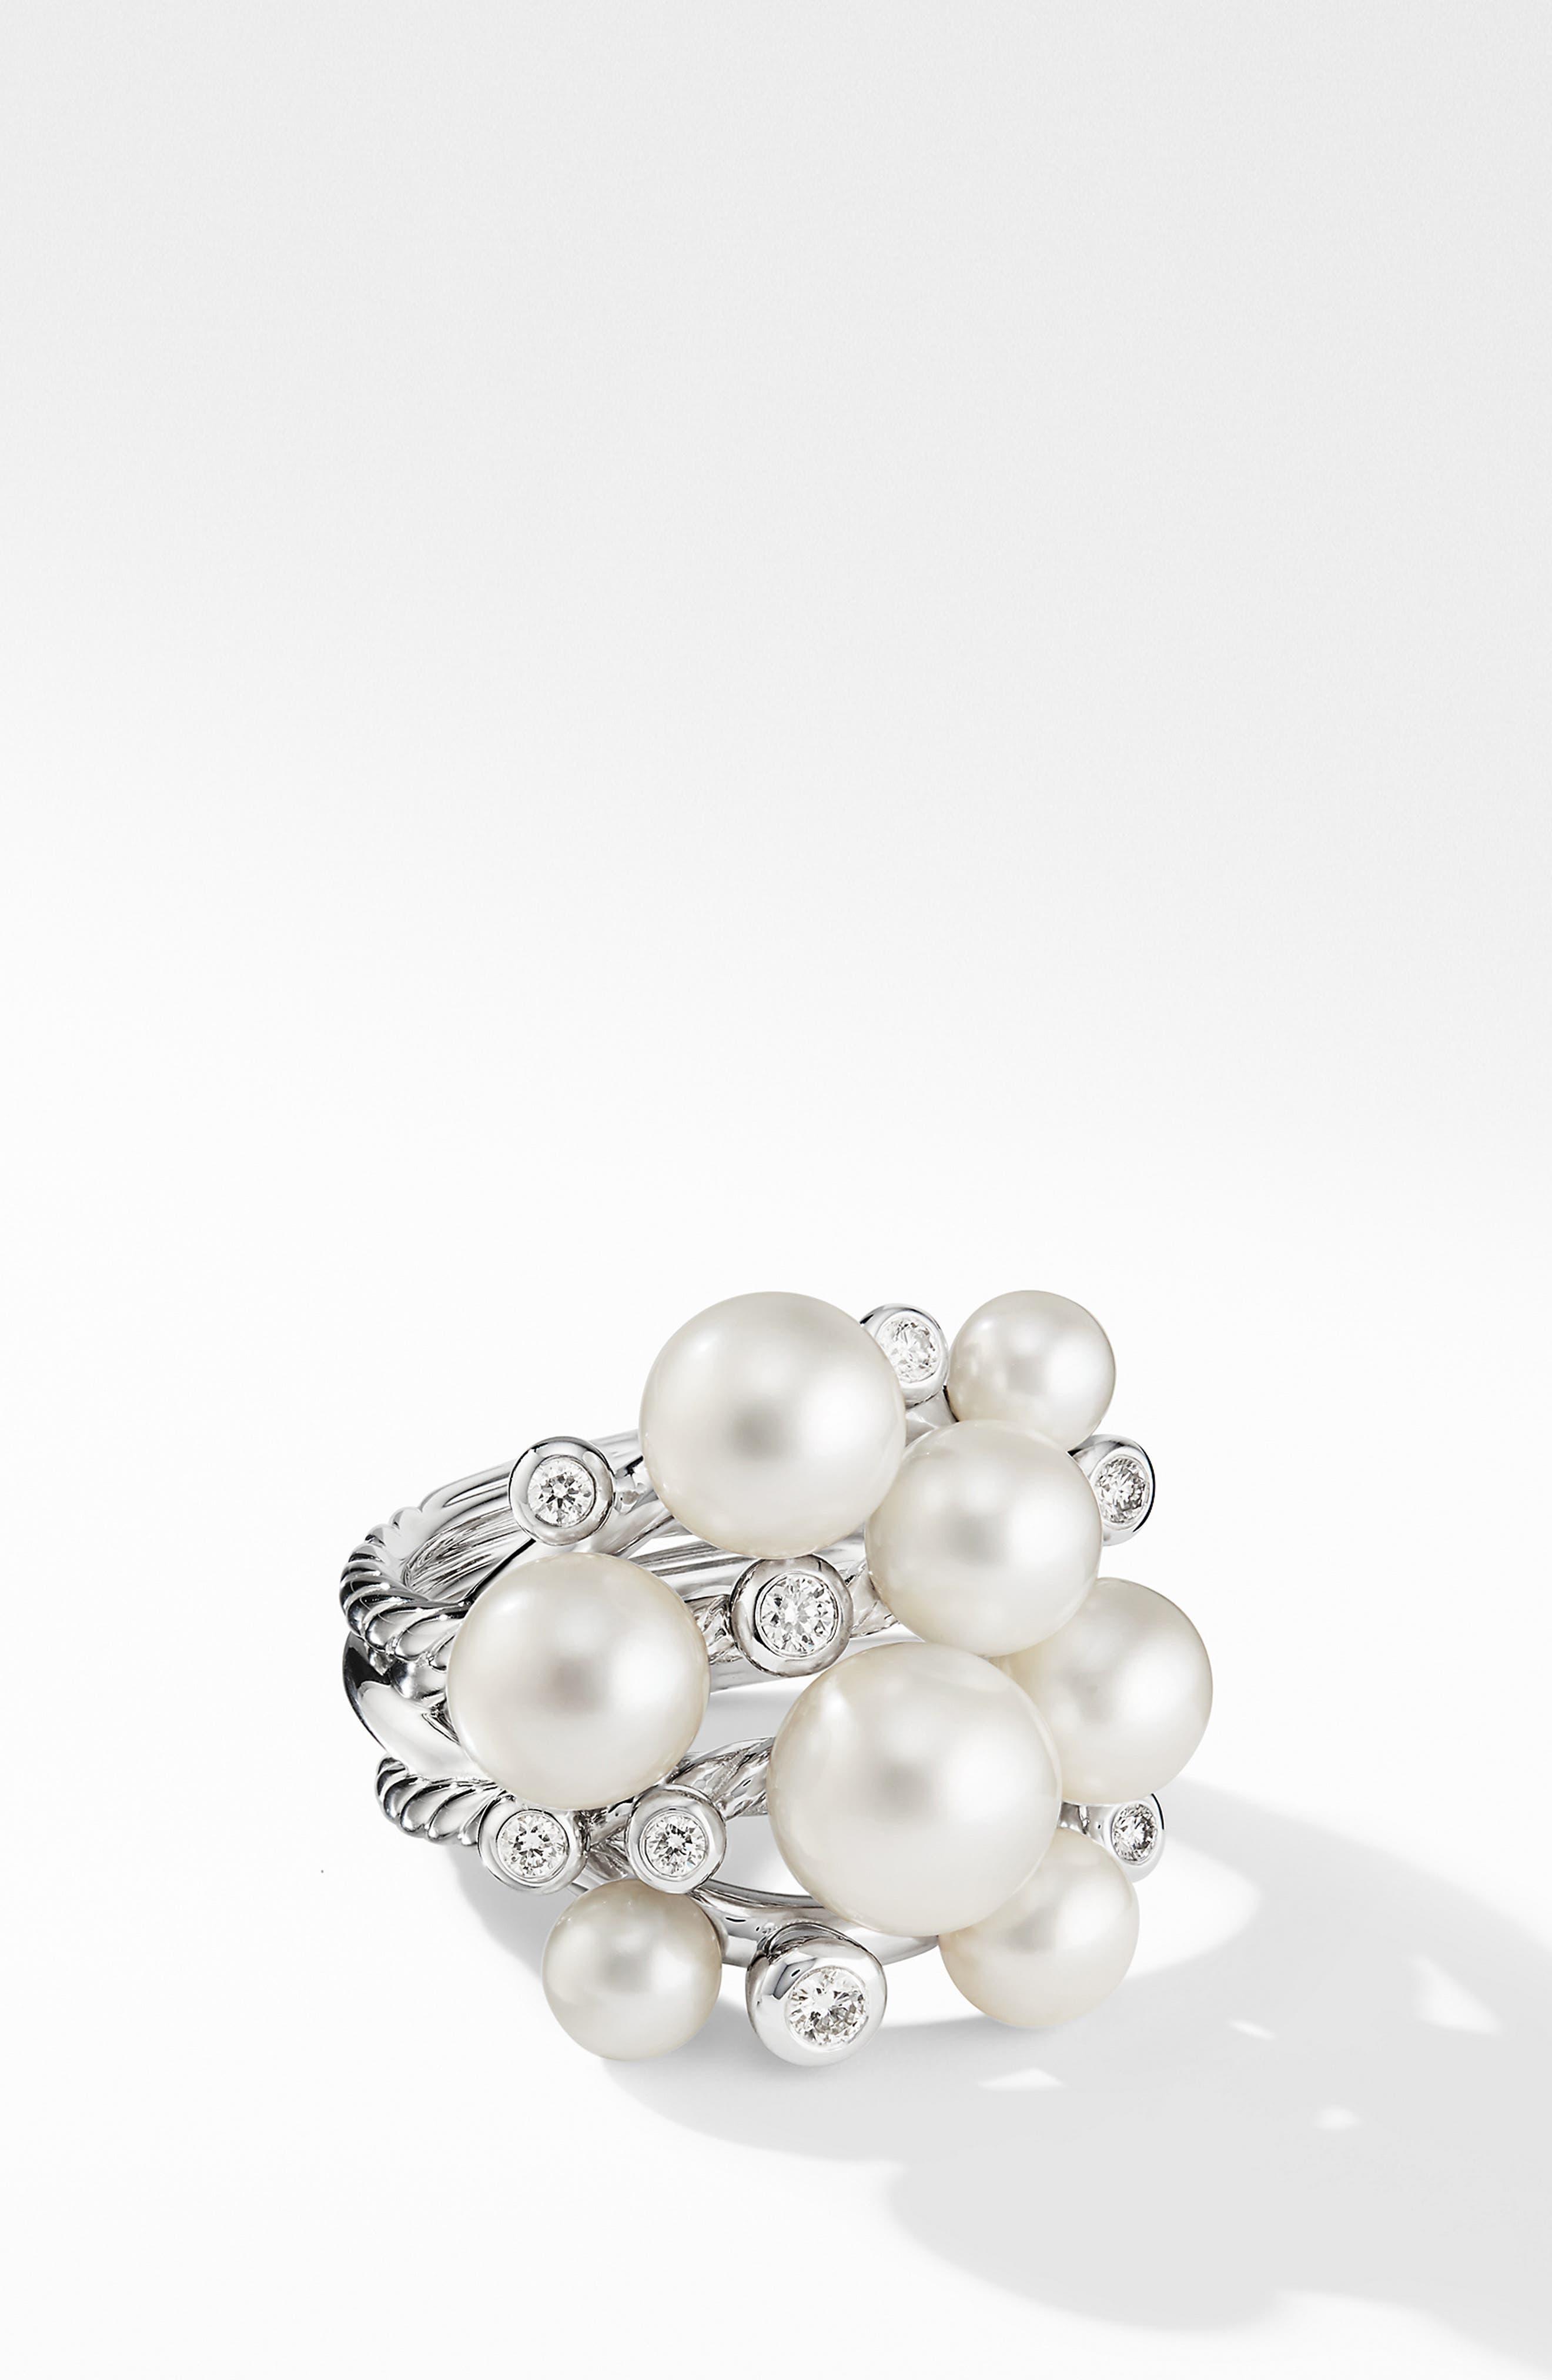 DAVID YURMAN, Large Pearl Cluster Ring with Diamonds, Main thumbnail 1, color, SILVER/ DIAMOND/ PEARL